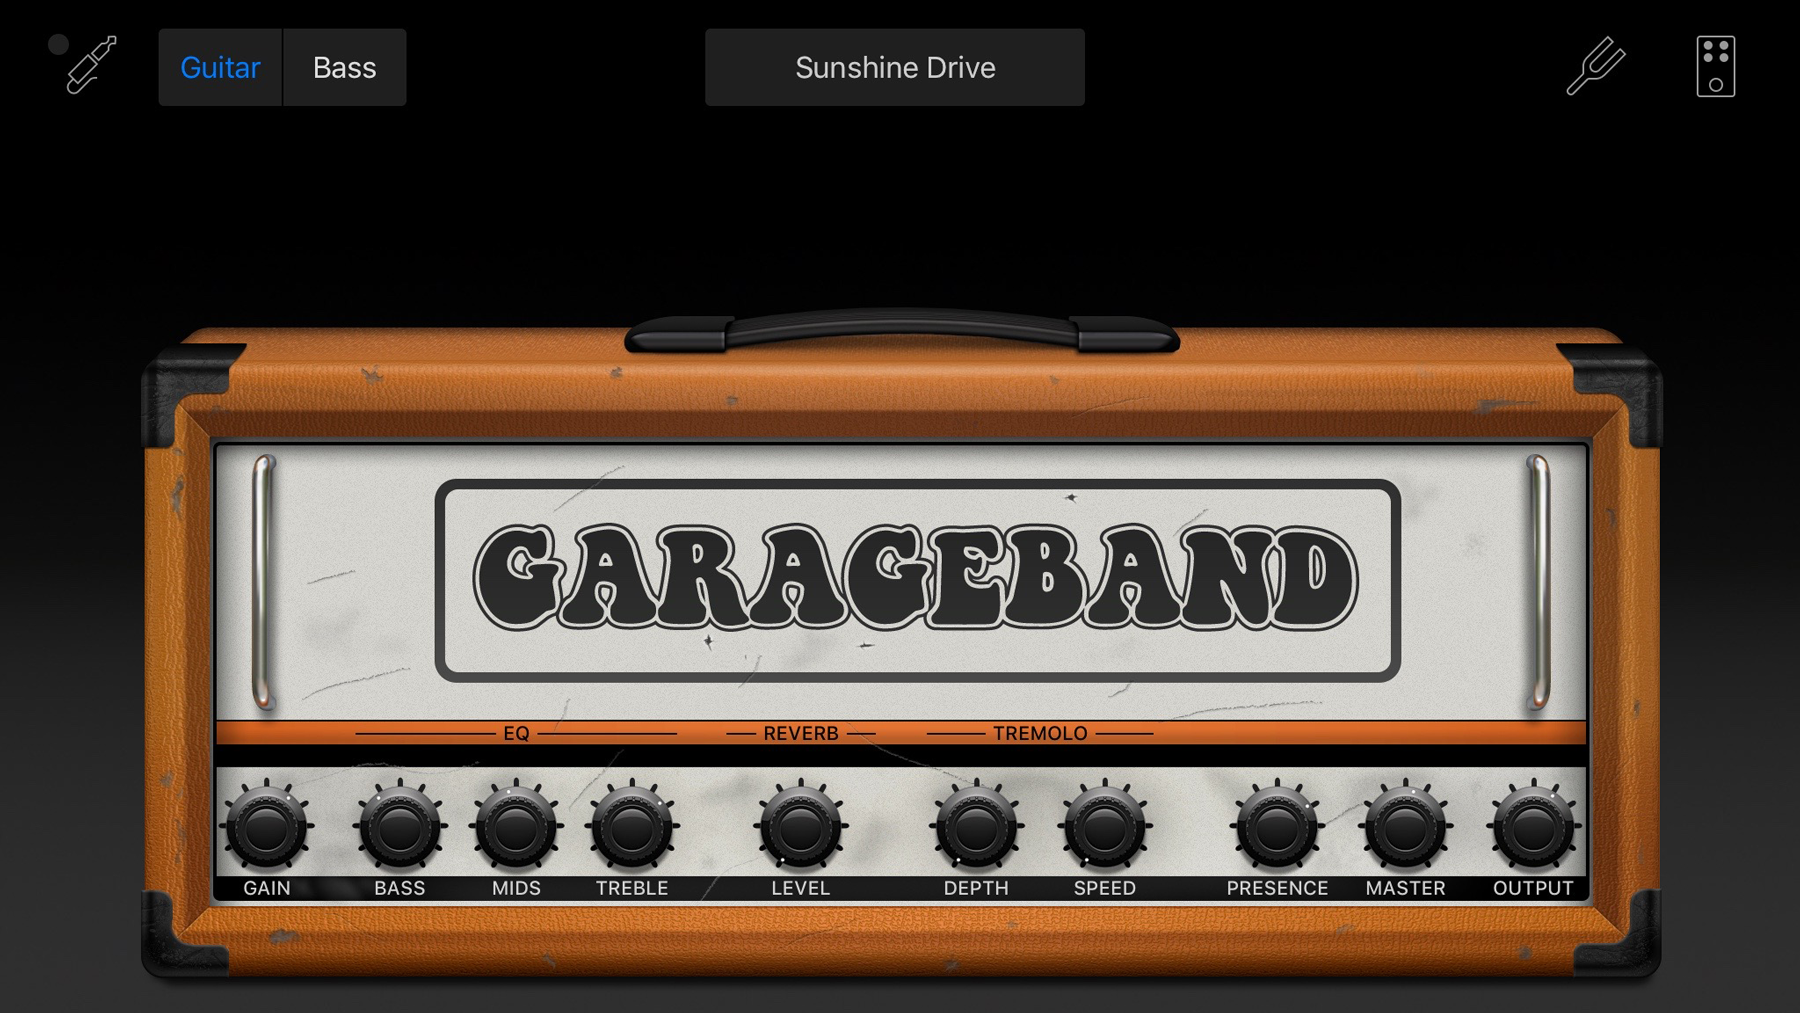 How to use GarageBand on iPhone and iPad: Sunshine Drive